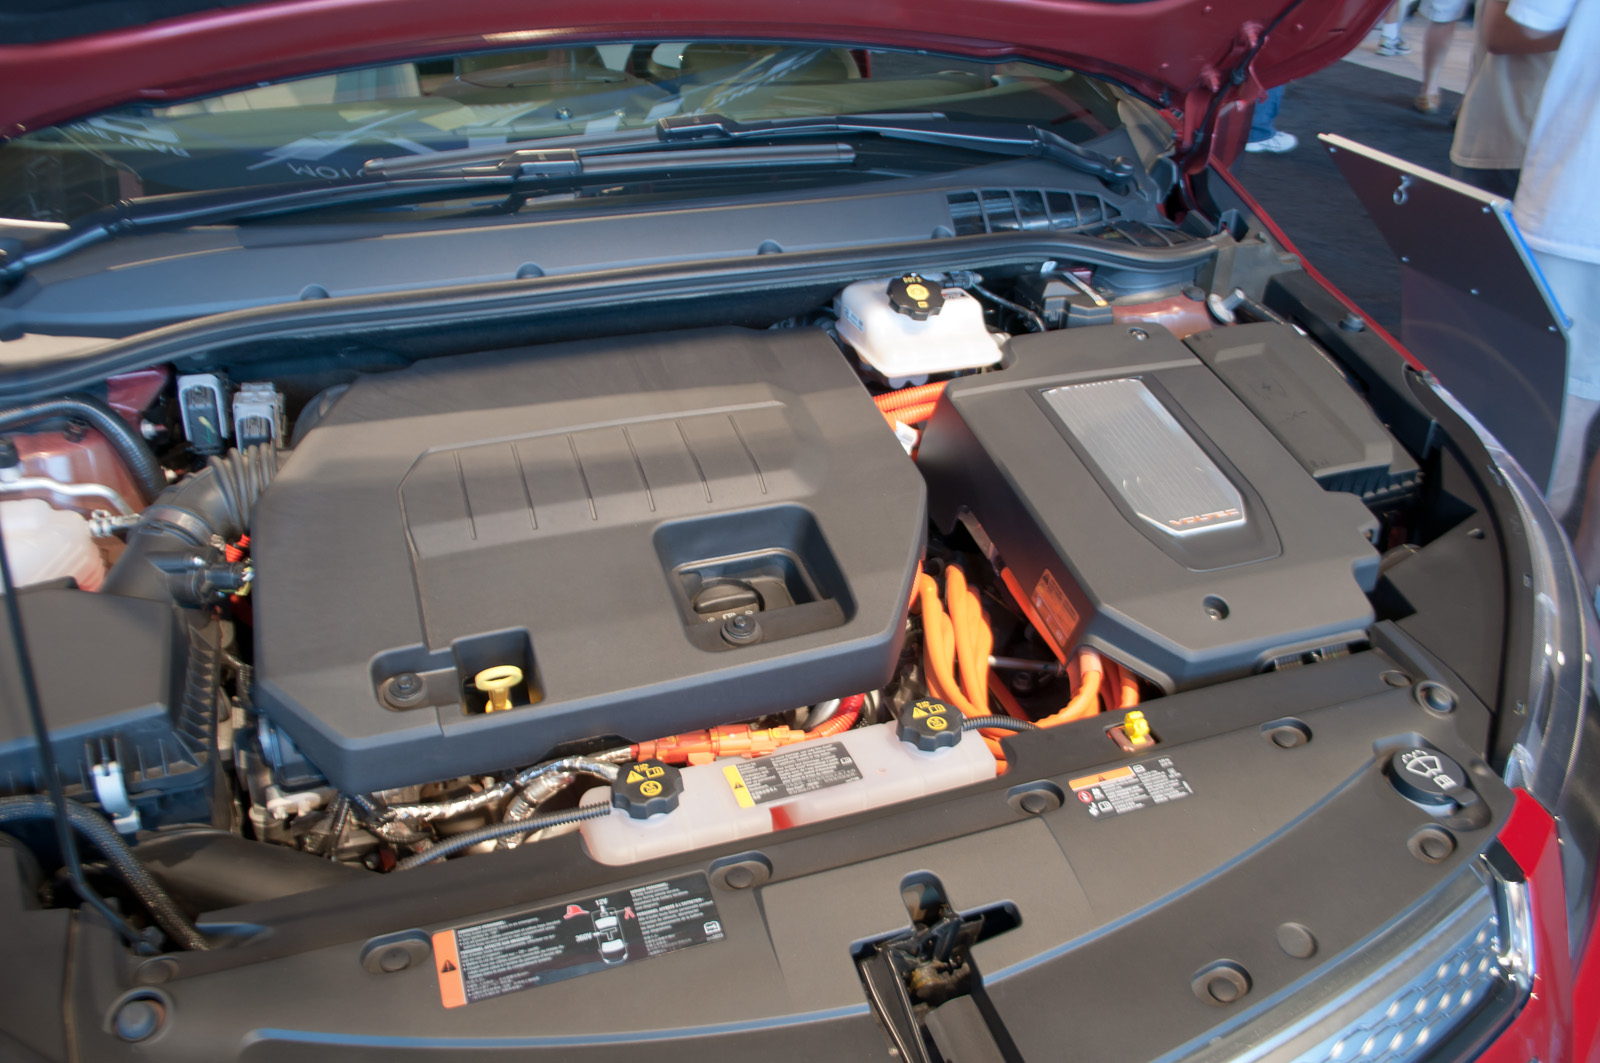 Chevy Bolt - 200 mile range for $30k base price (after ...